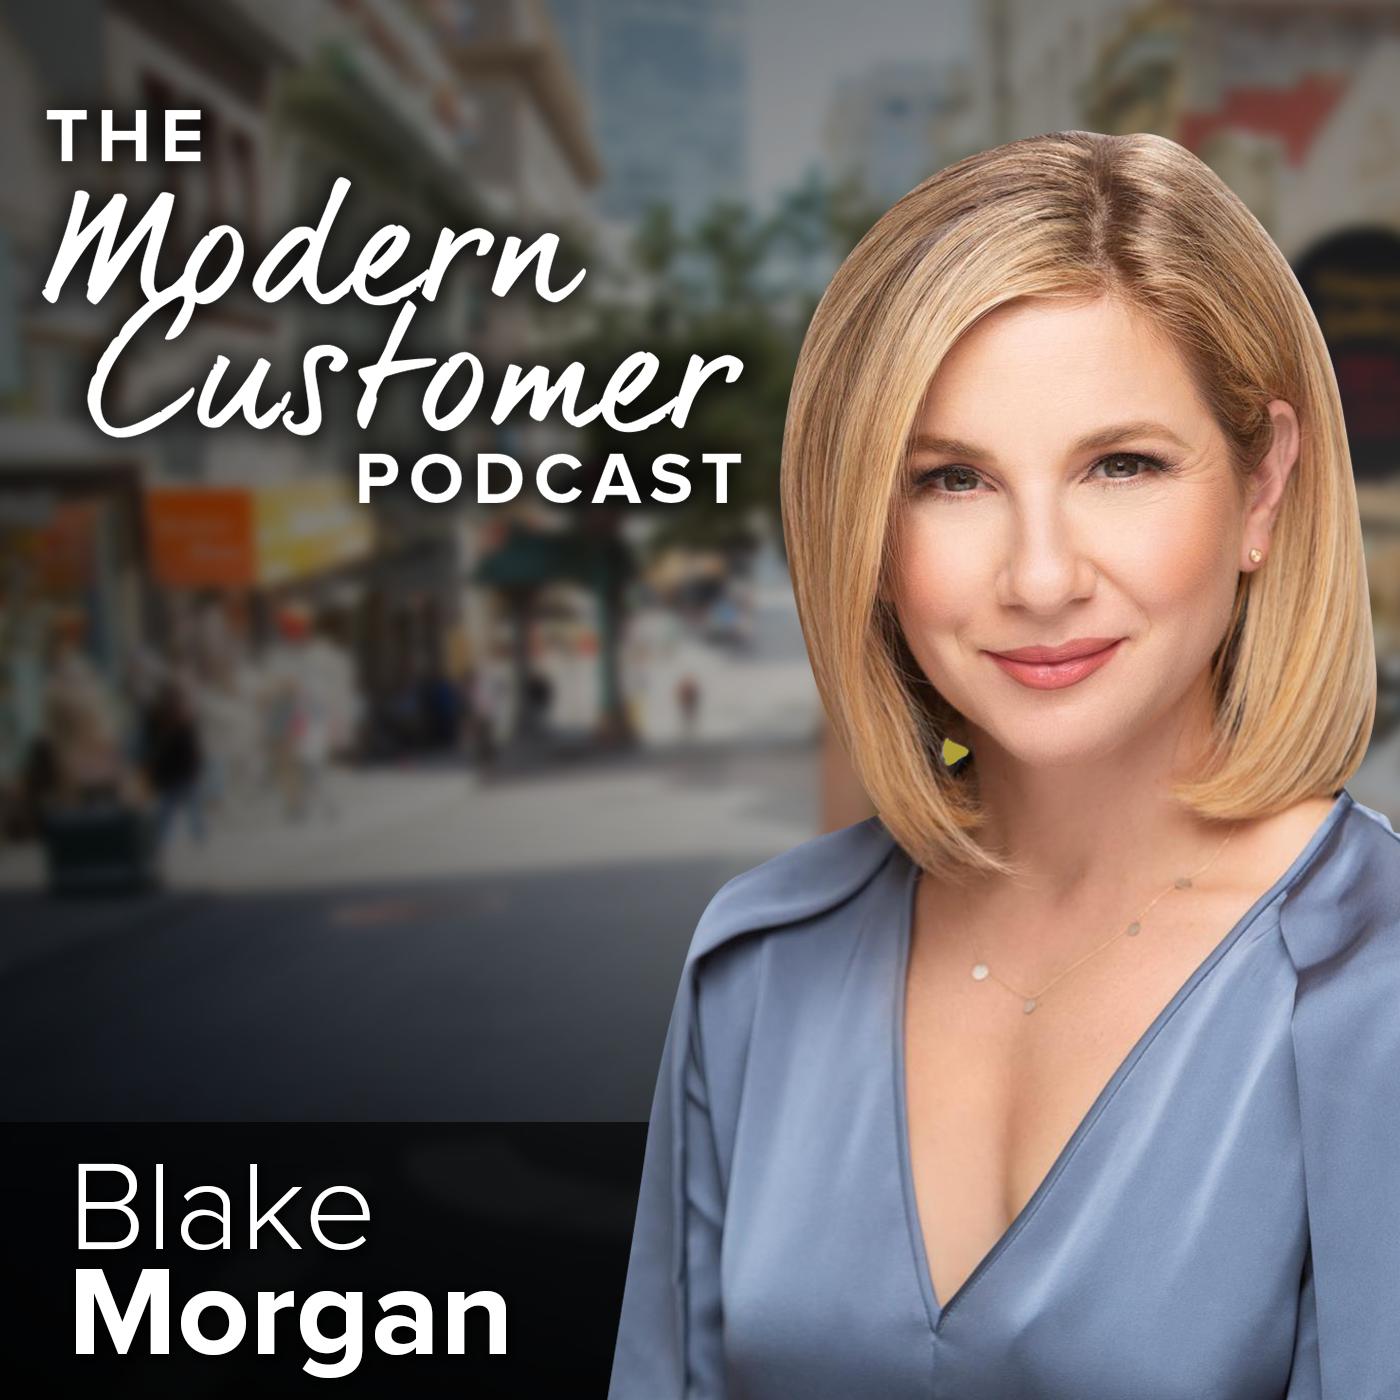 The Modern Customer Podcast show art